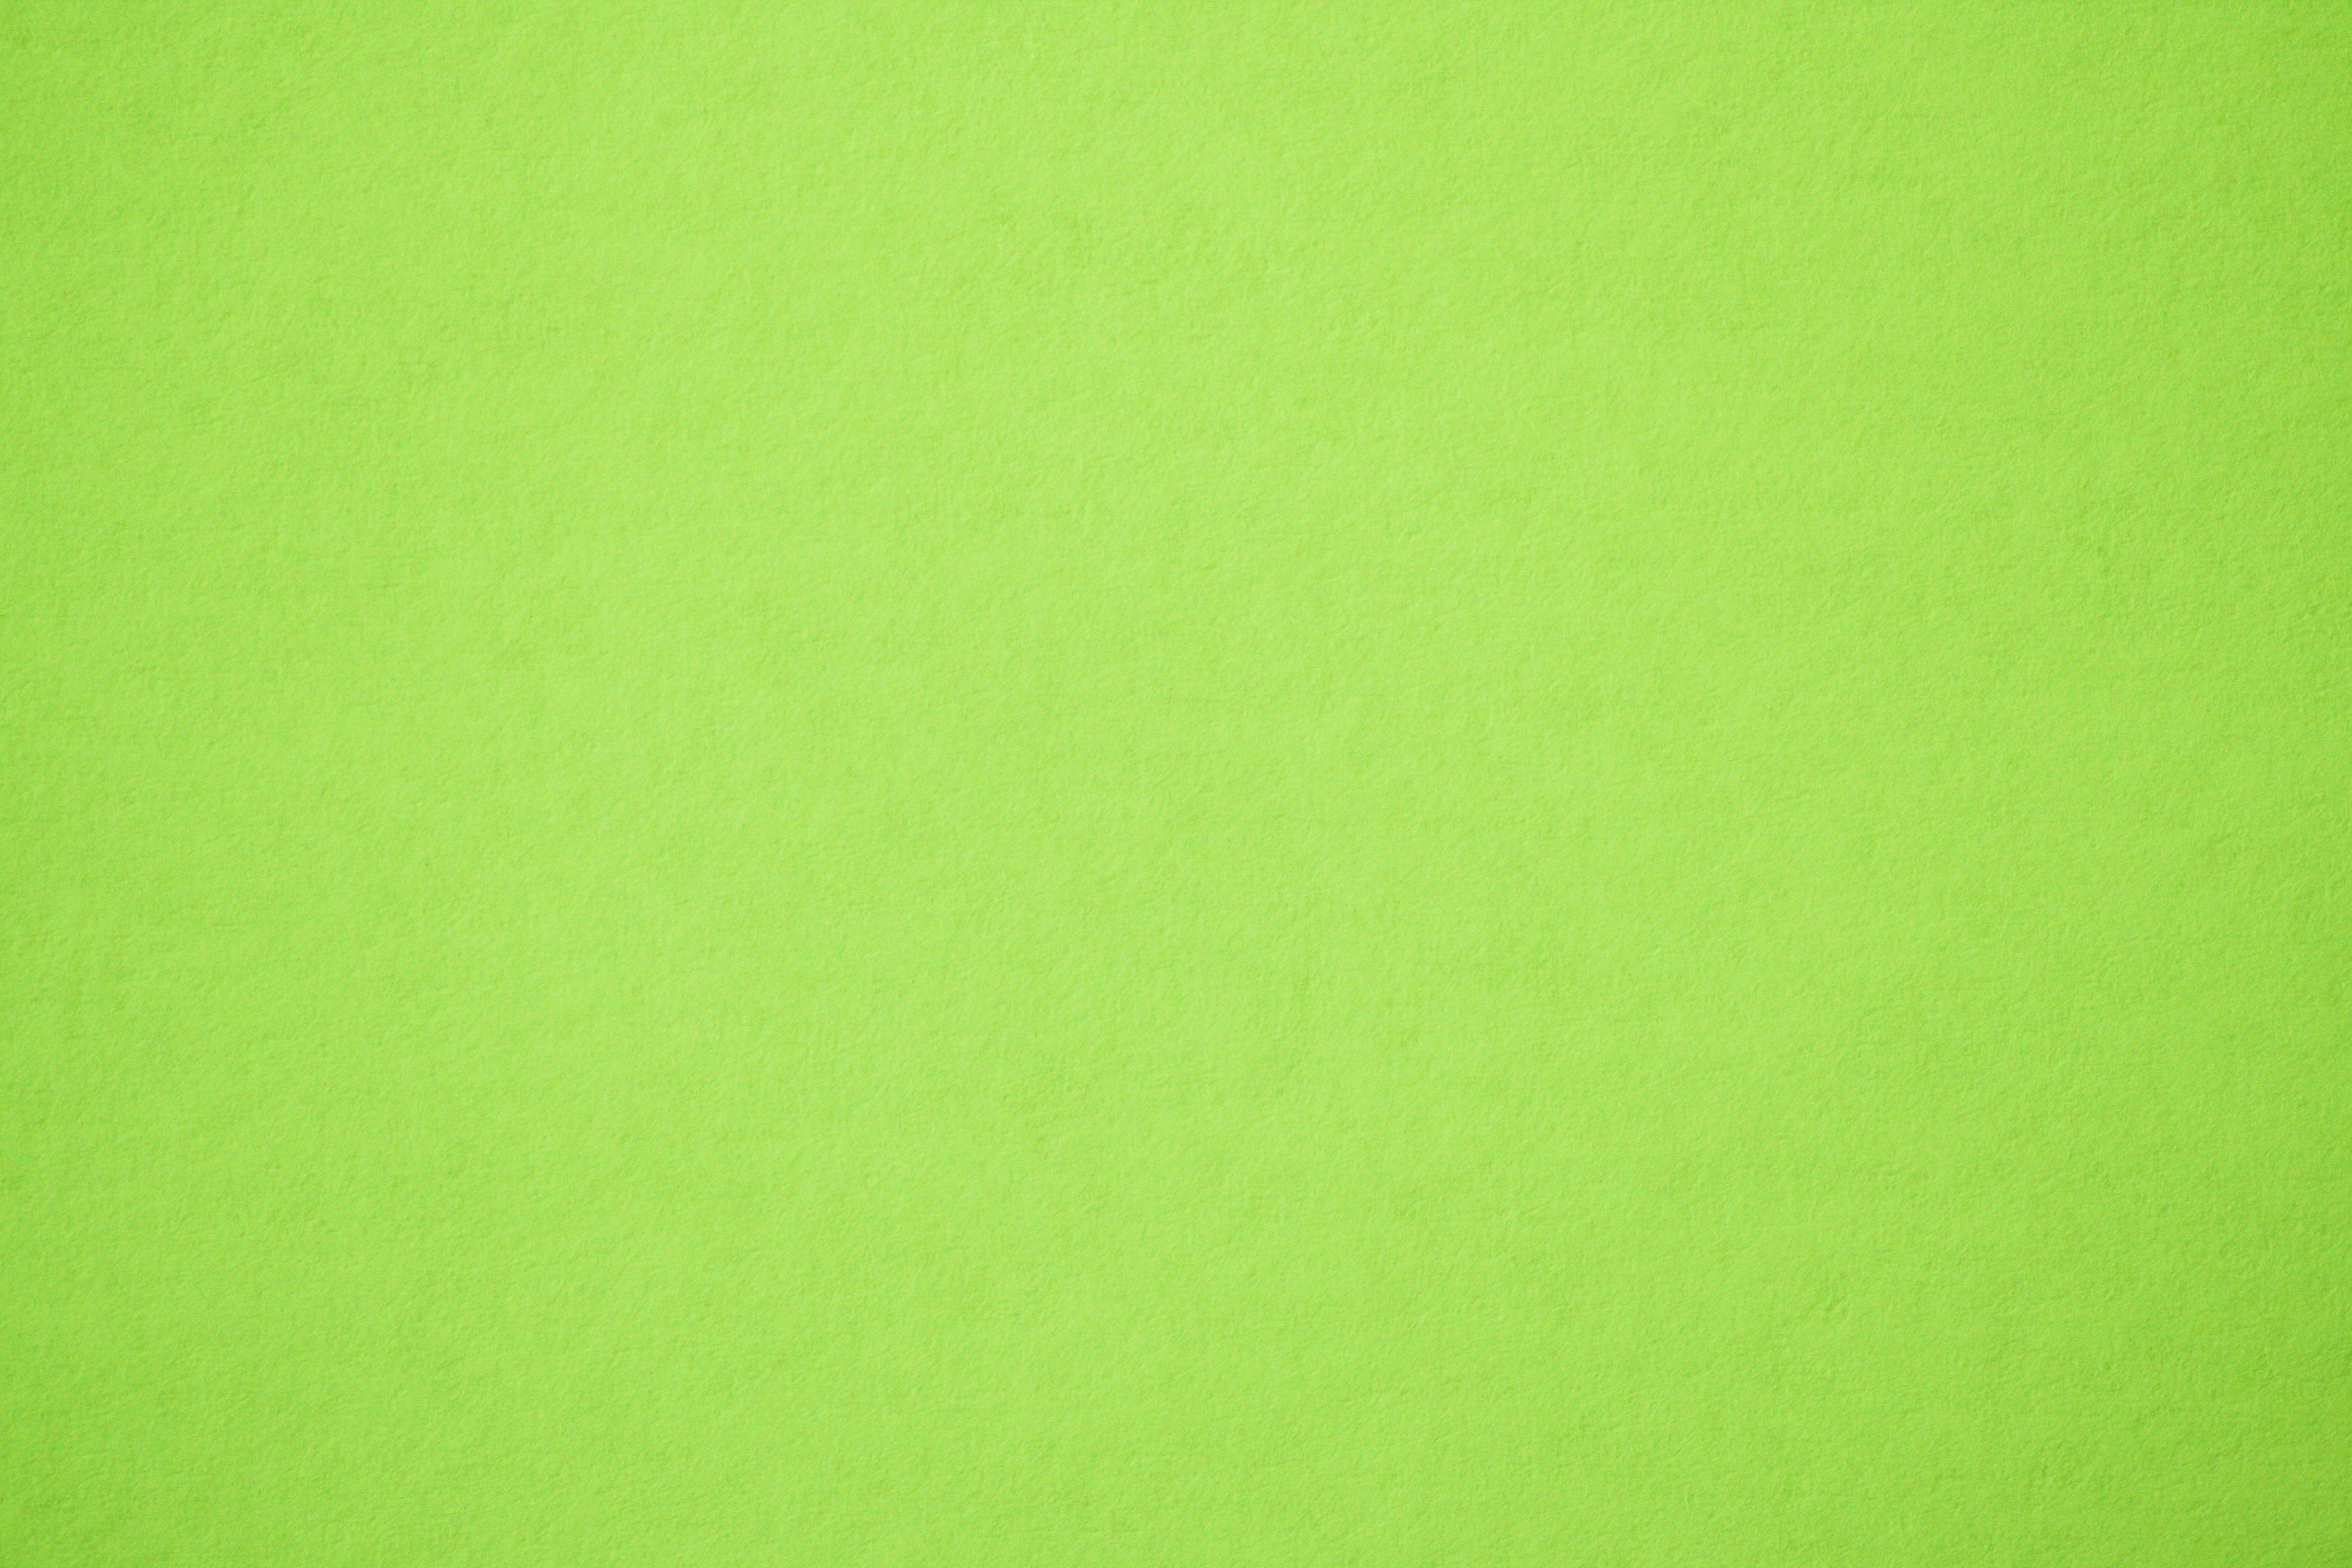 Lime Green Paper Texture Photos Public Domain